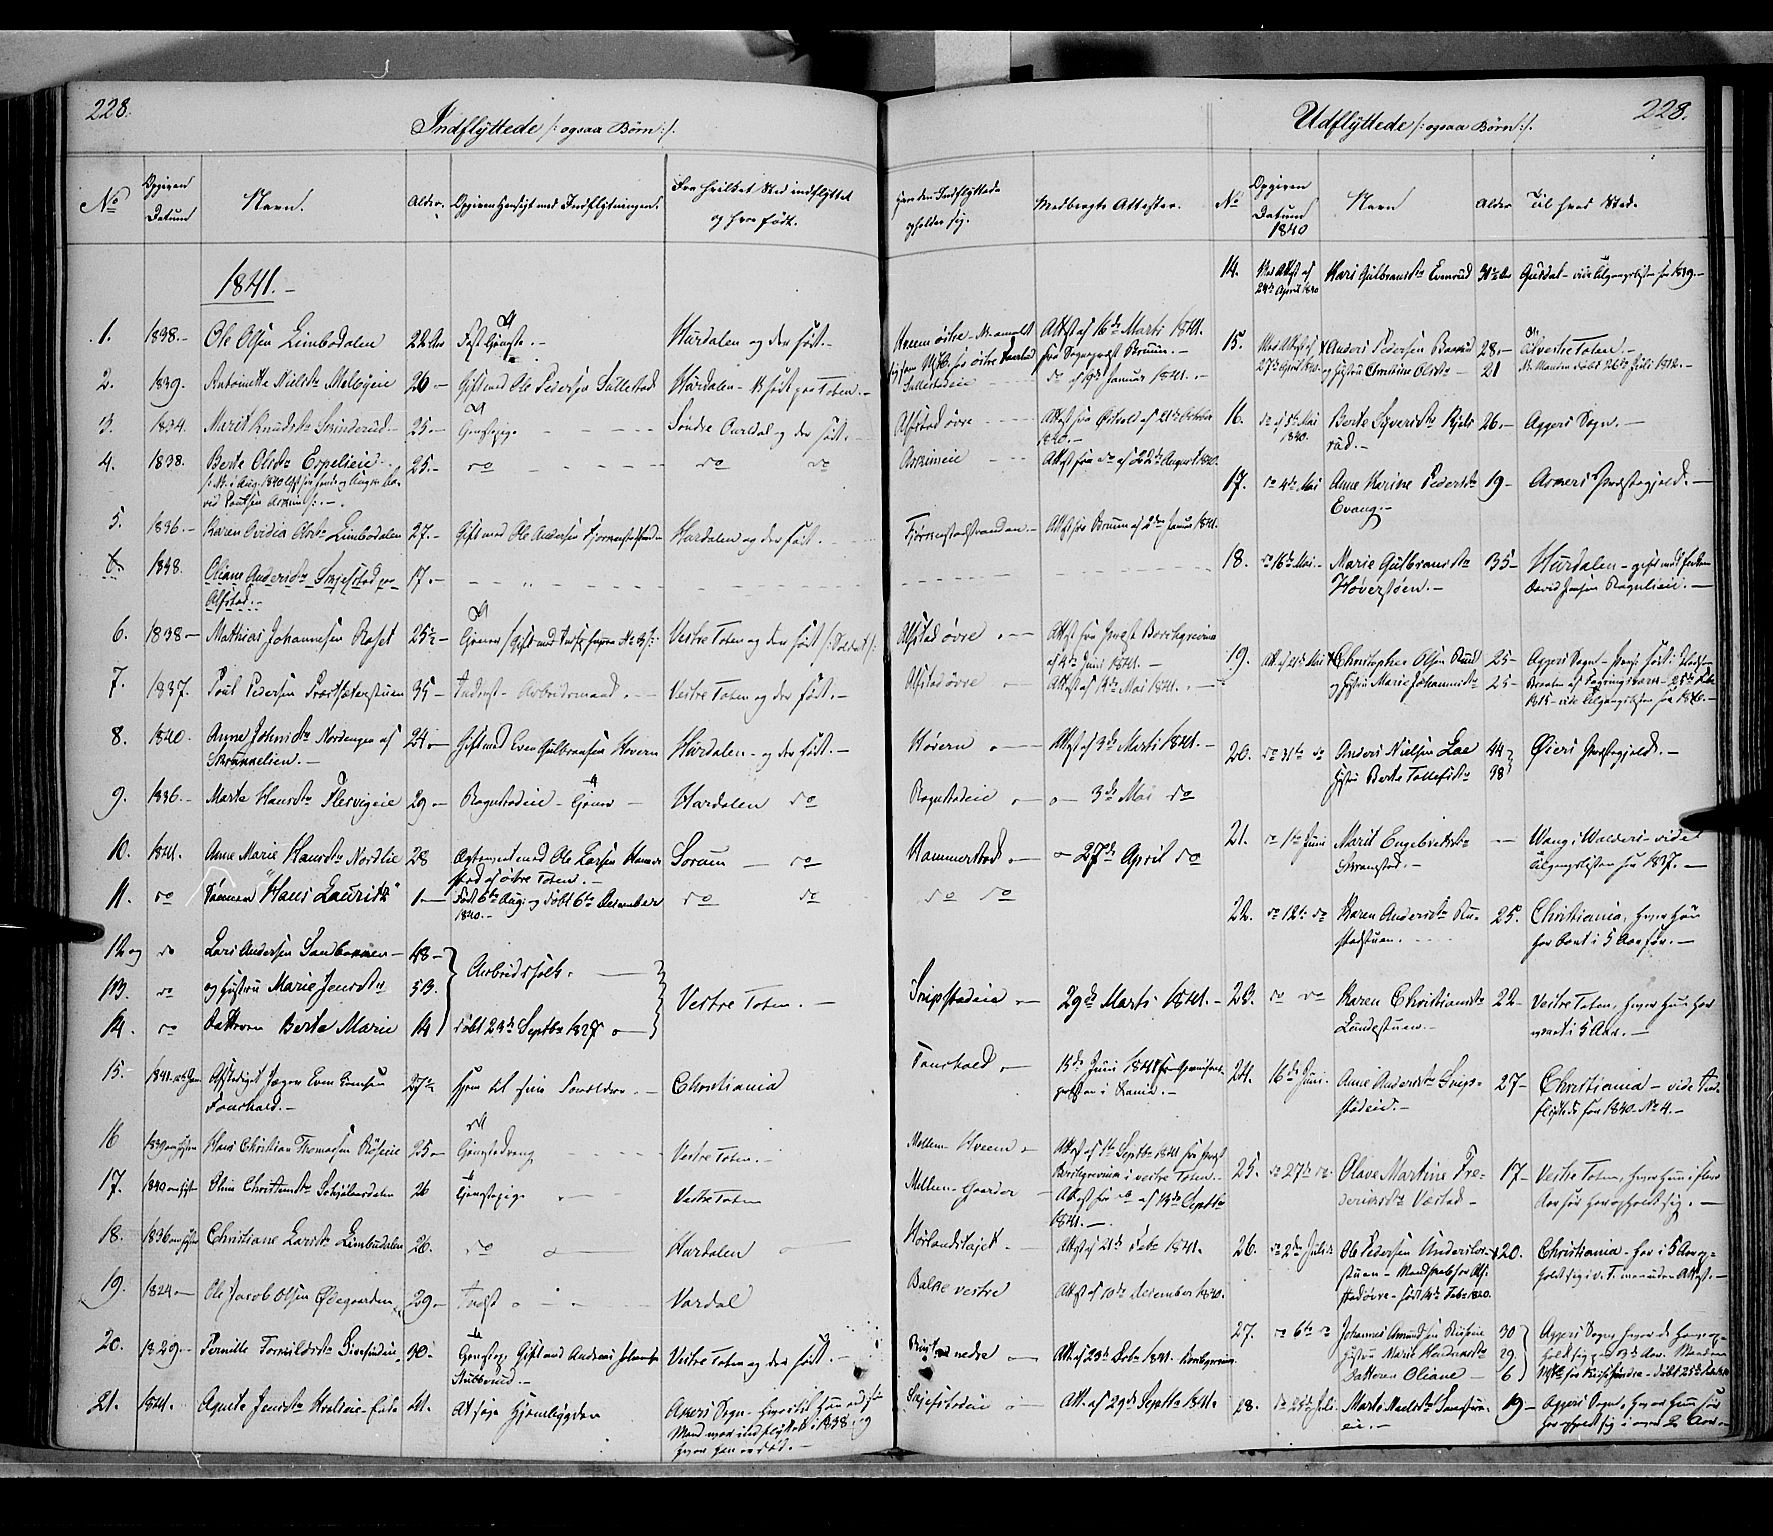 SAH, Østre Toten prestekontor, Ministerialbok nr. 2, 1840-1847, s. 228